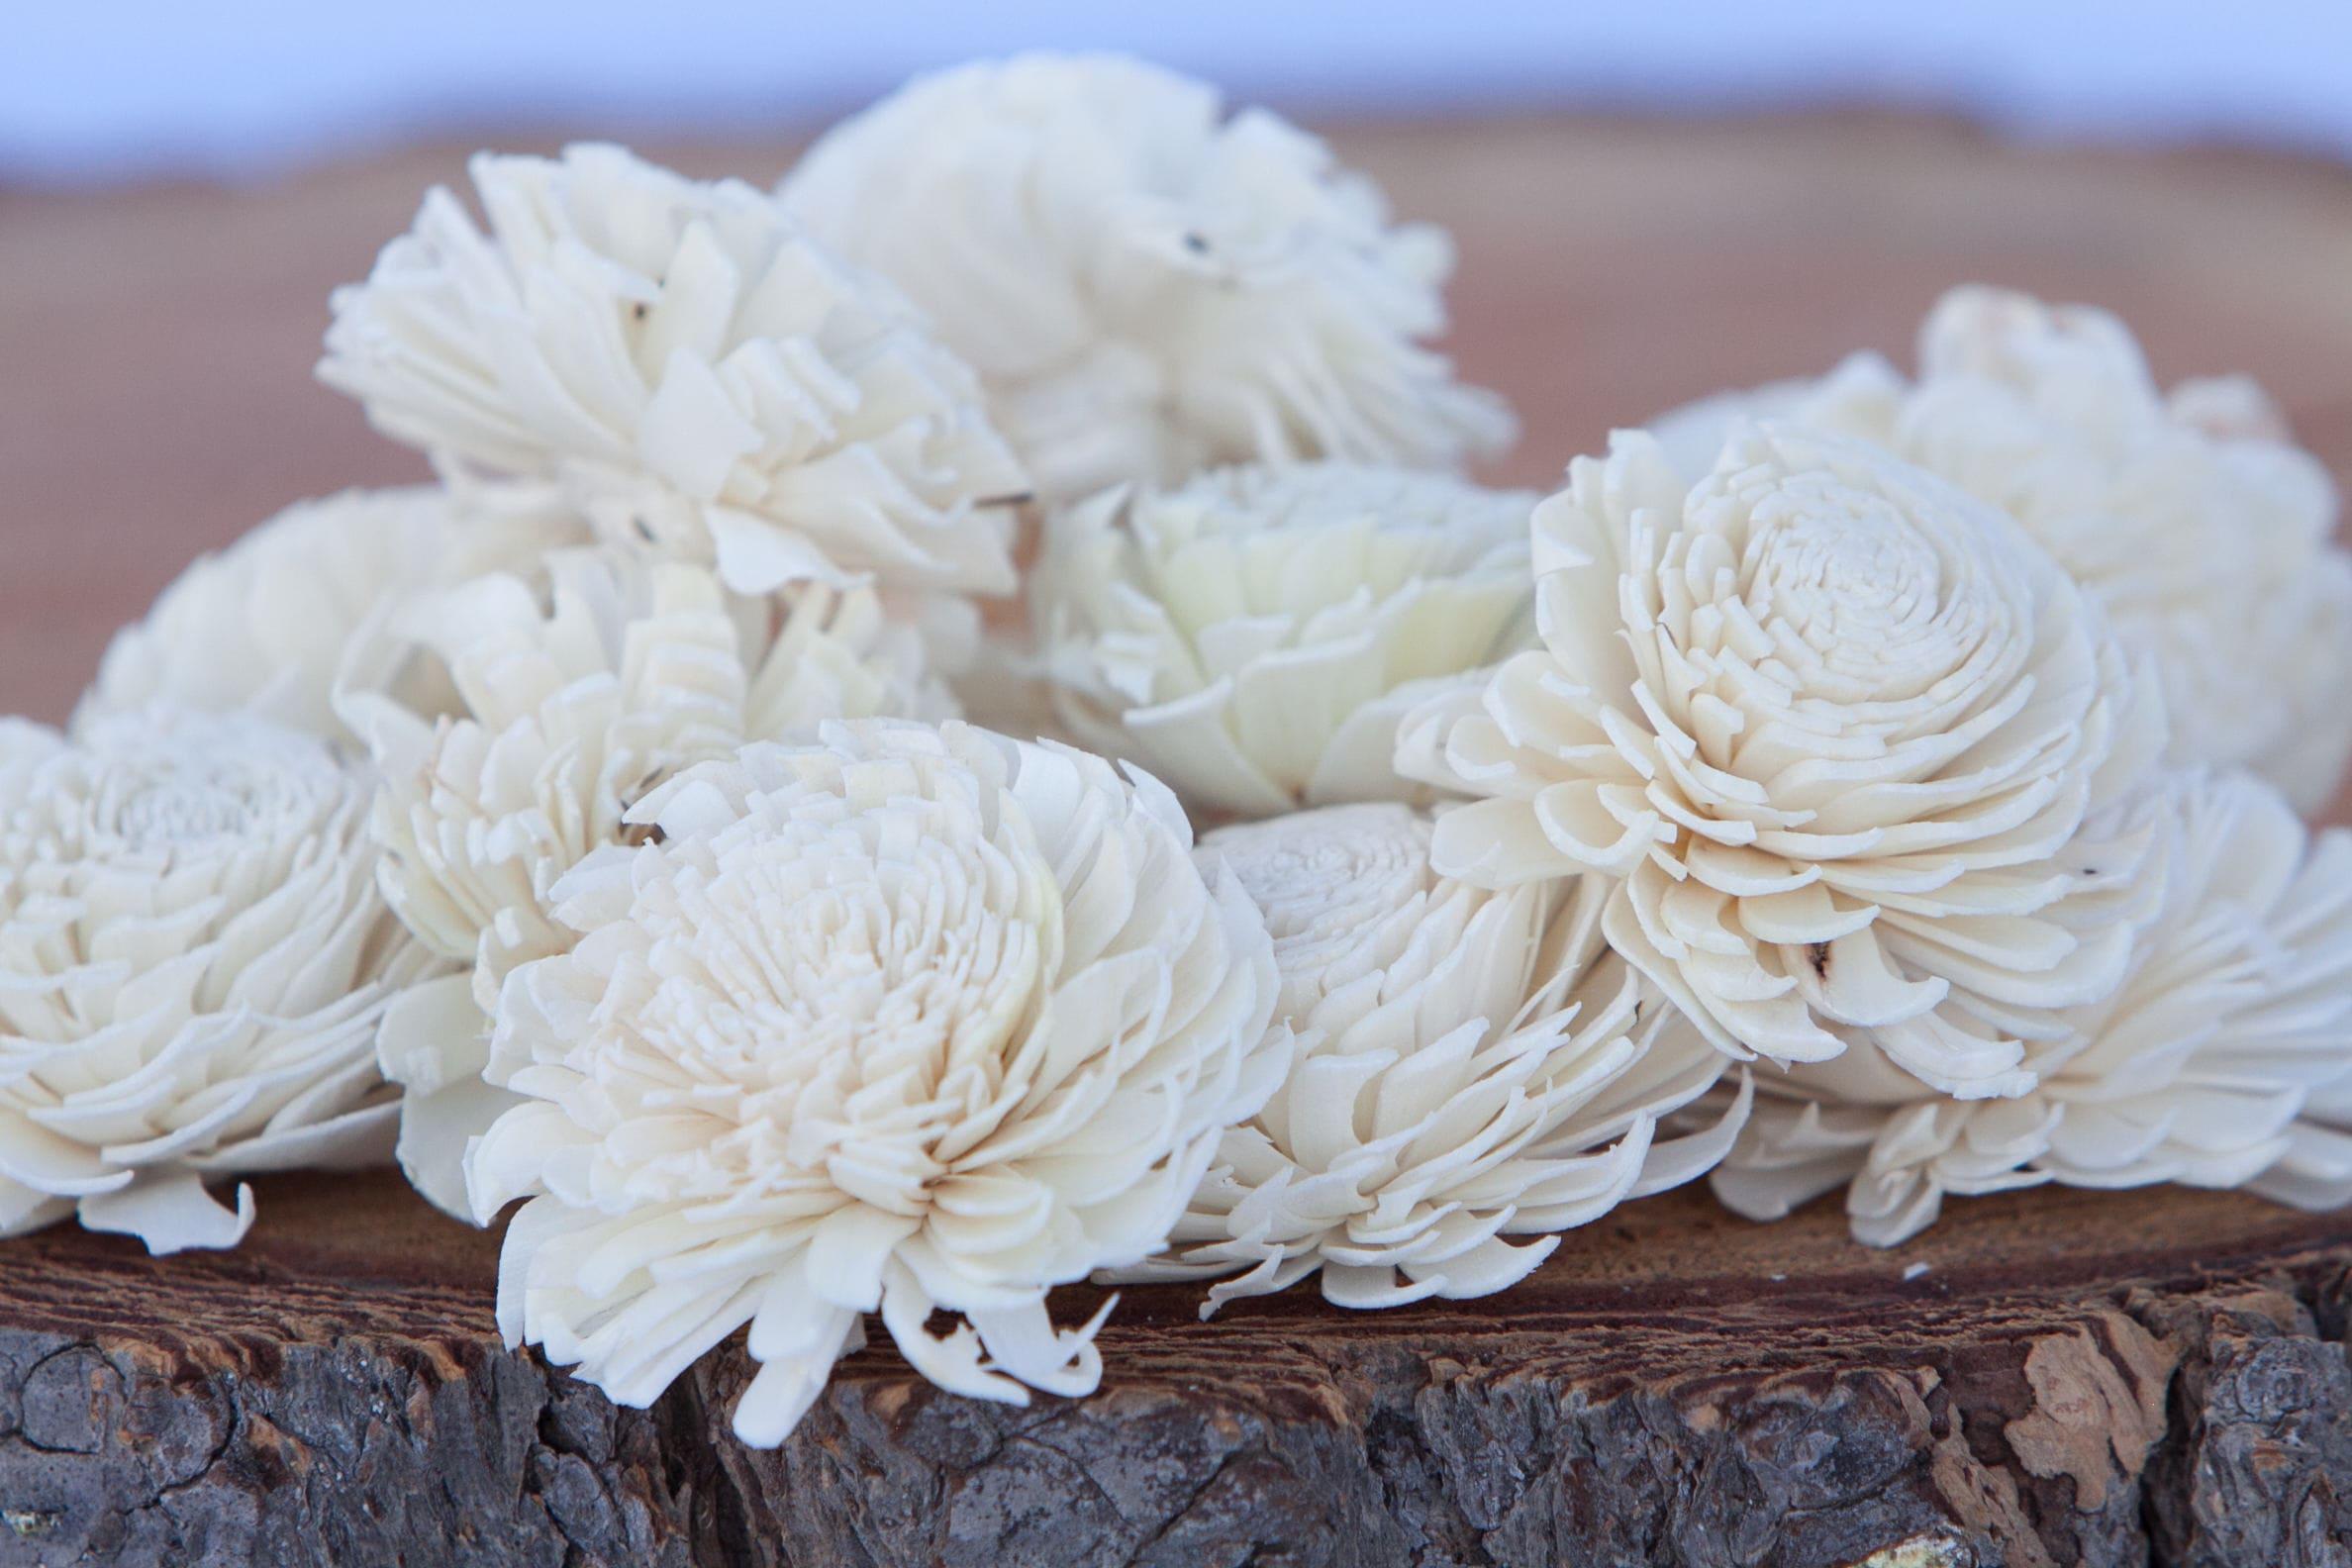 Chorki sola flowers set of 10 chorki sola wood sola flowers chorki sola flowers set of 10 chorki sola wood sola flowers chorki sola balsa wood flowers wedding diy flowers for crafting izmirmasajfo